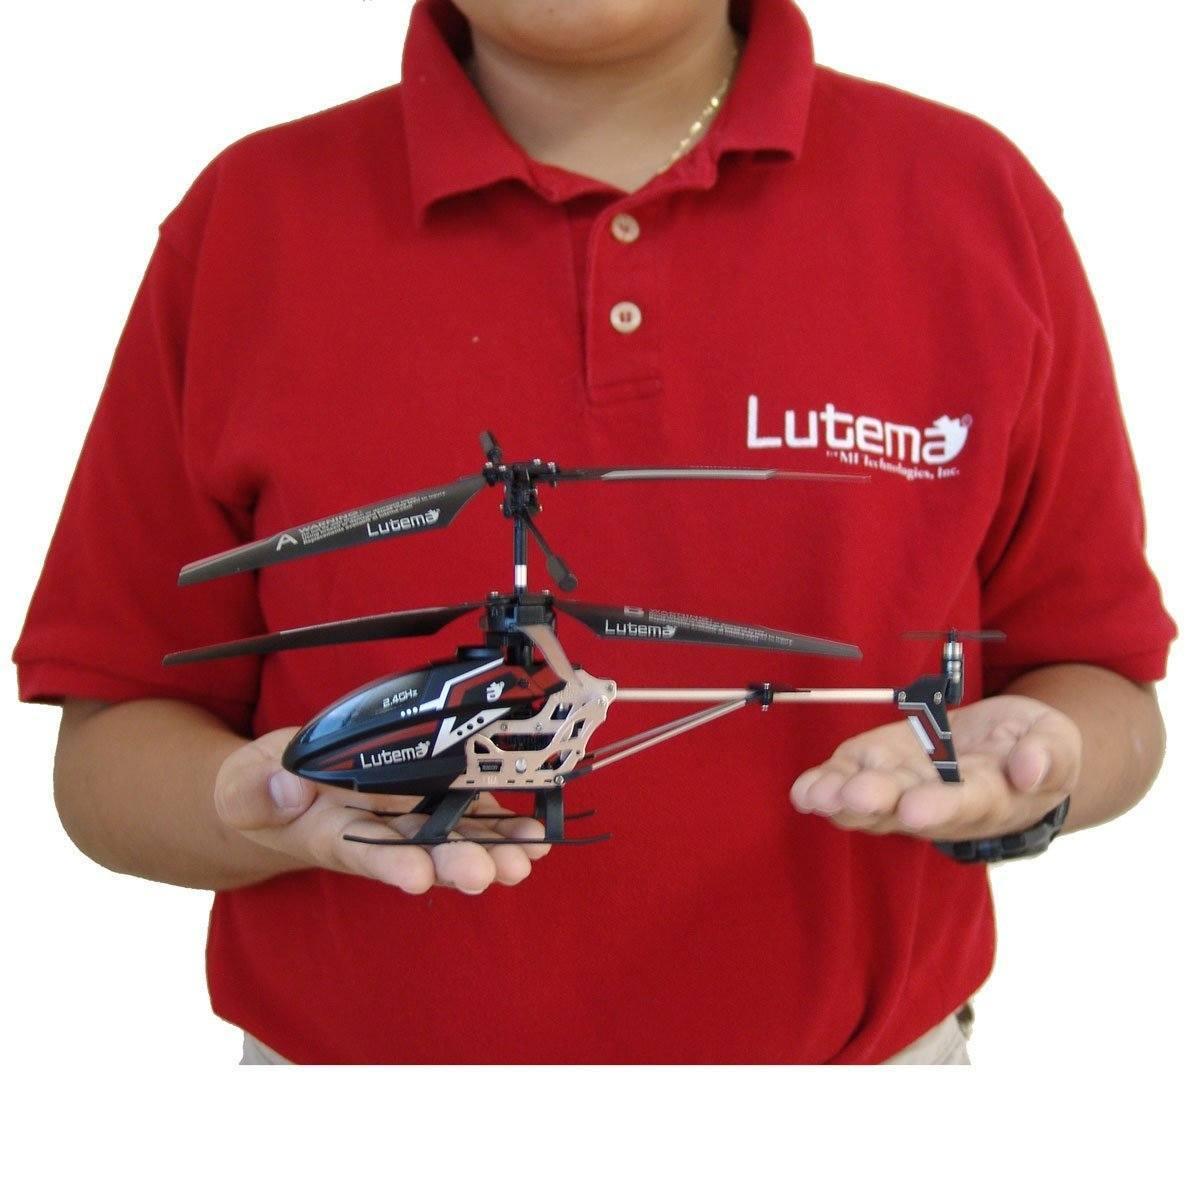 2015 Hottest Kids Rc Toys Lutema 2 4 Heligram Flight Simulator R C